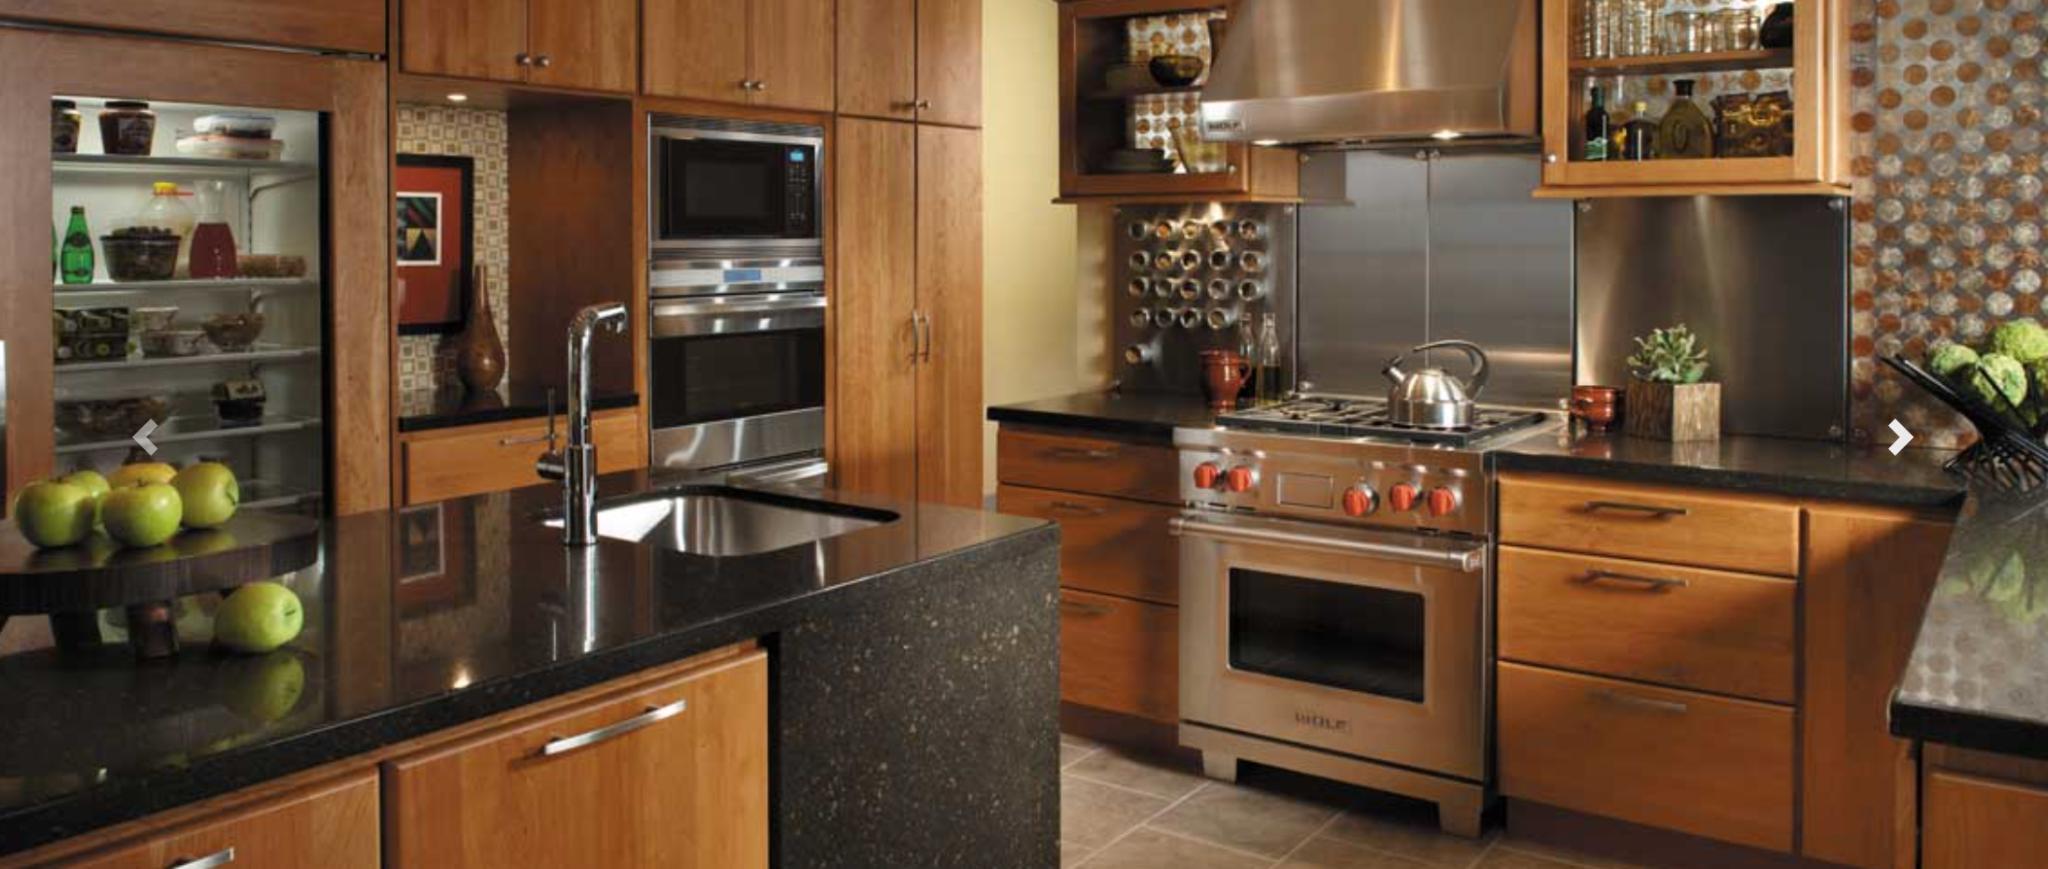 StarMark Cabinetry for kitchen redesign, Johnson Lumber, Maryland Kitchen Design